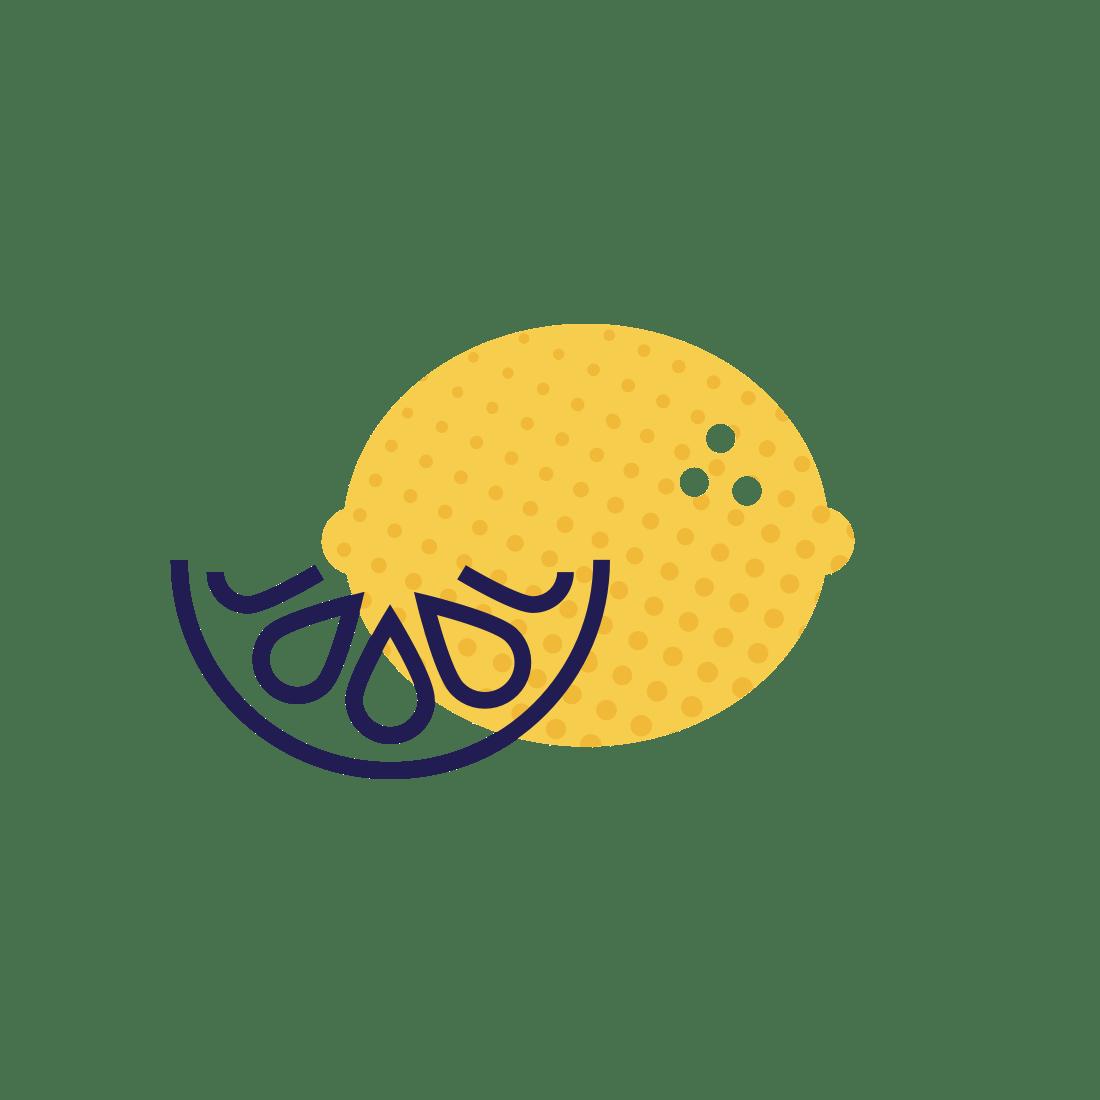 hight resolution of lemon